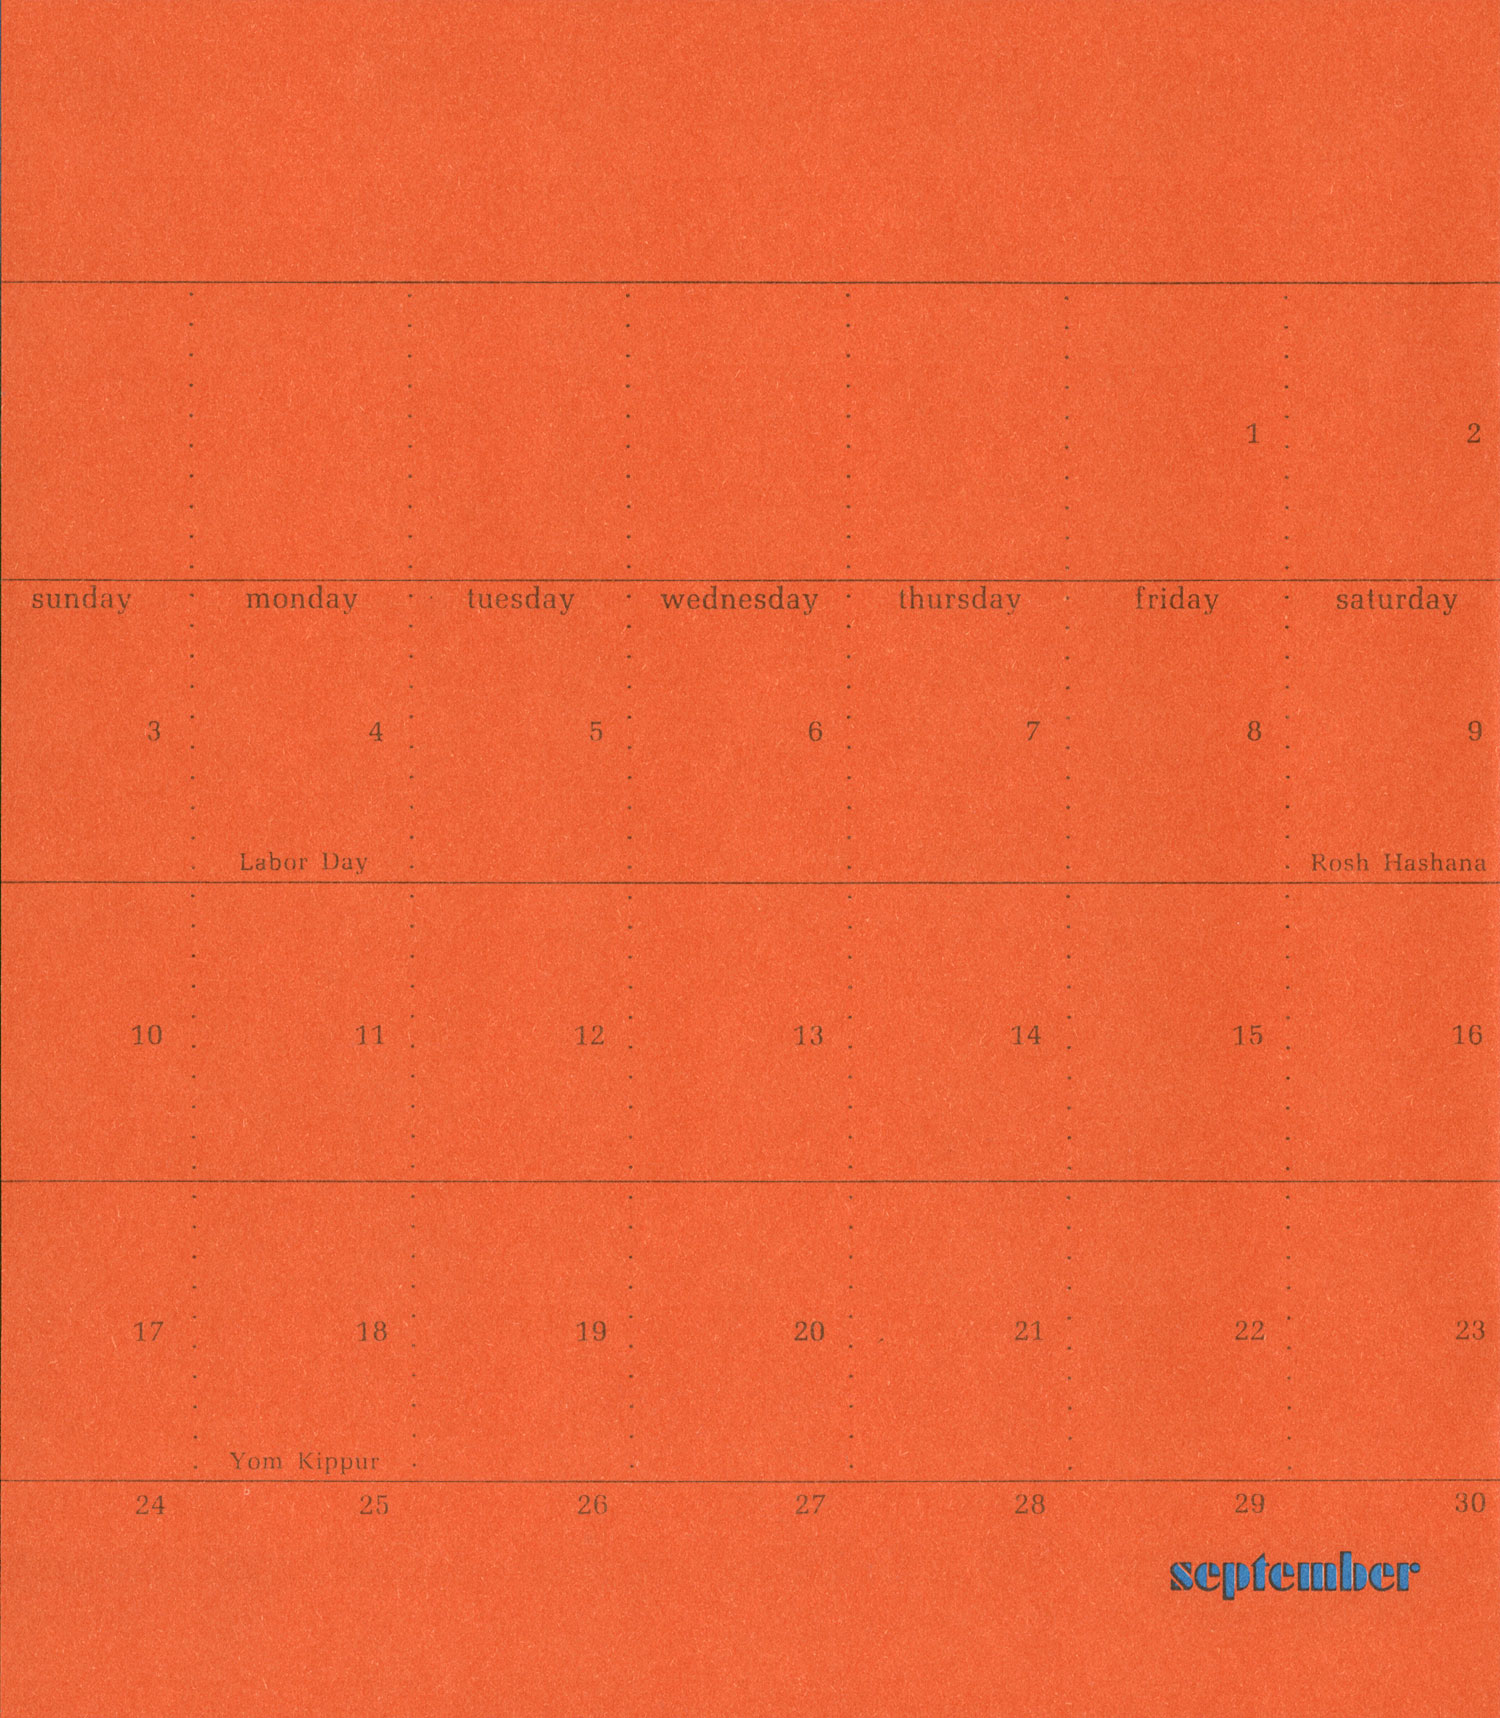 casual-corner-calendar-left-10.jpg